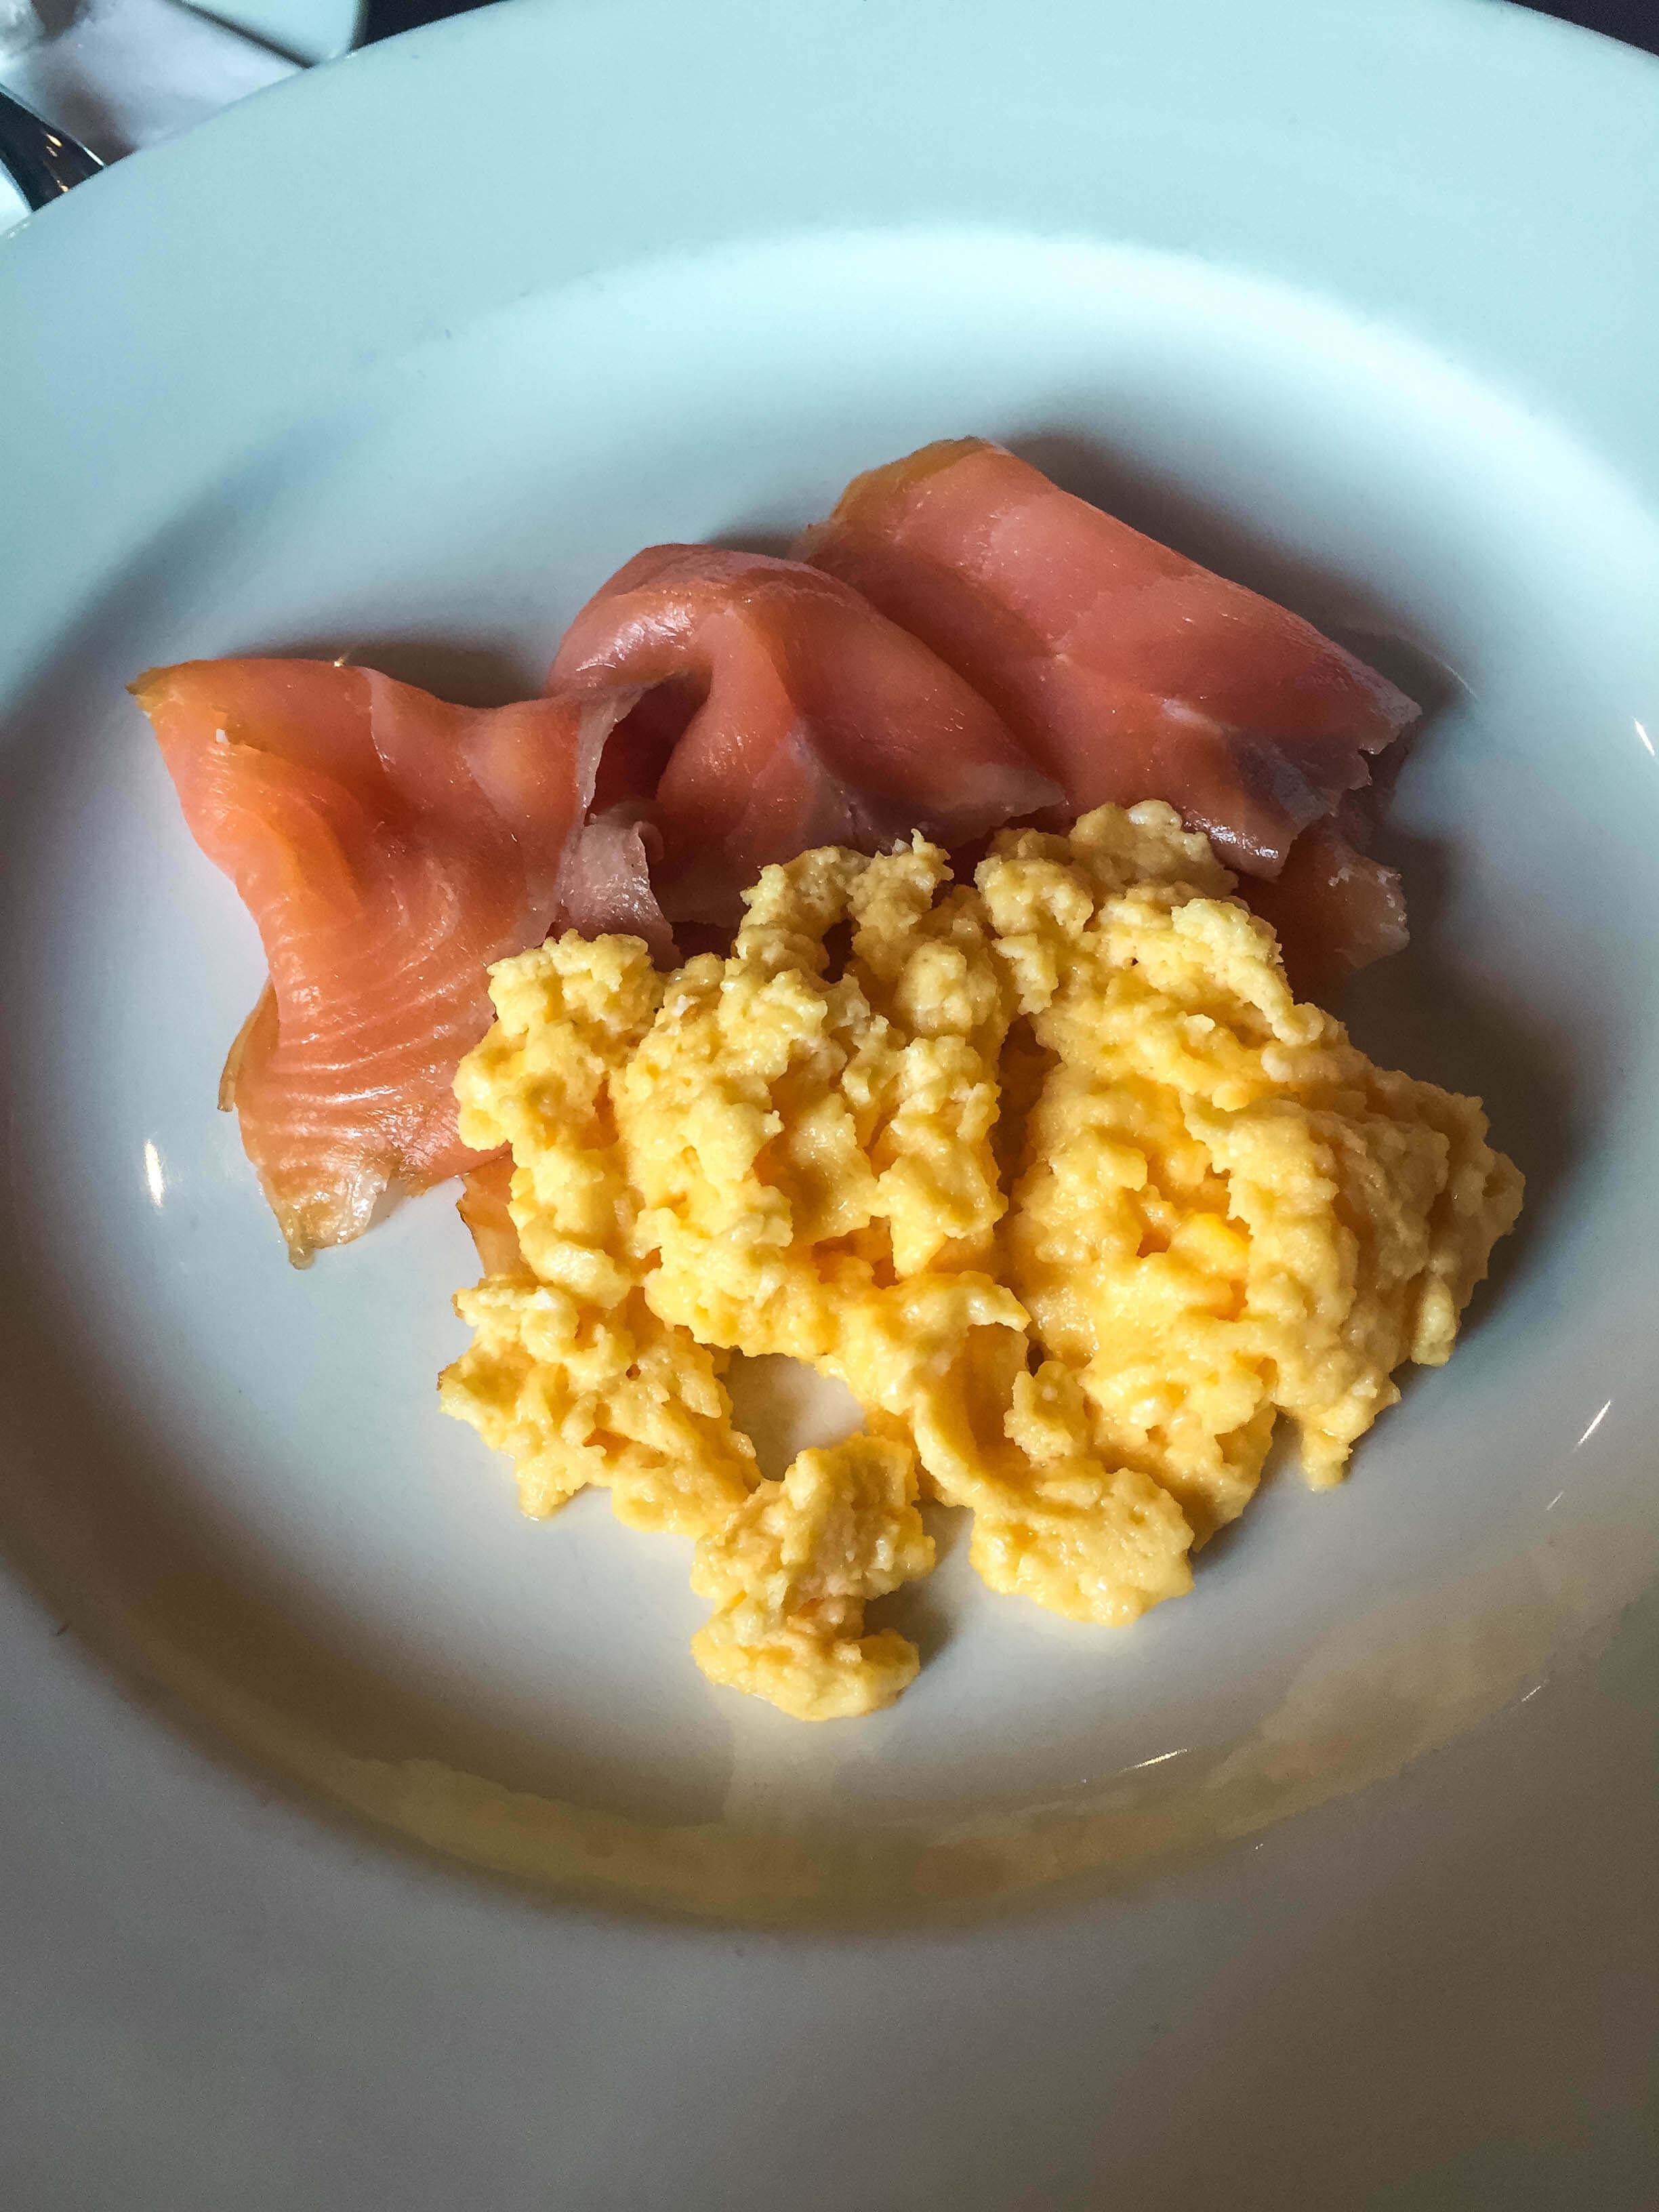 The Bonham Hotel Review - Salmon and Eggs Breakfast